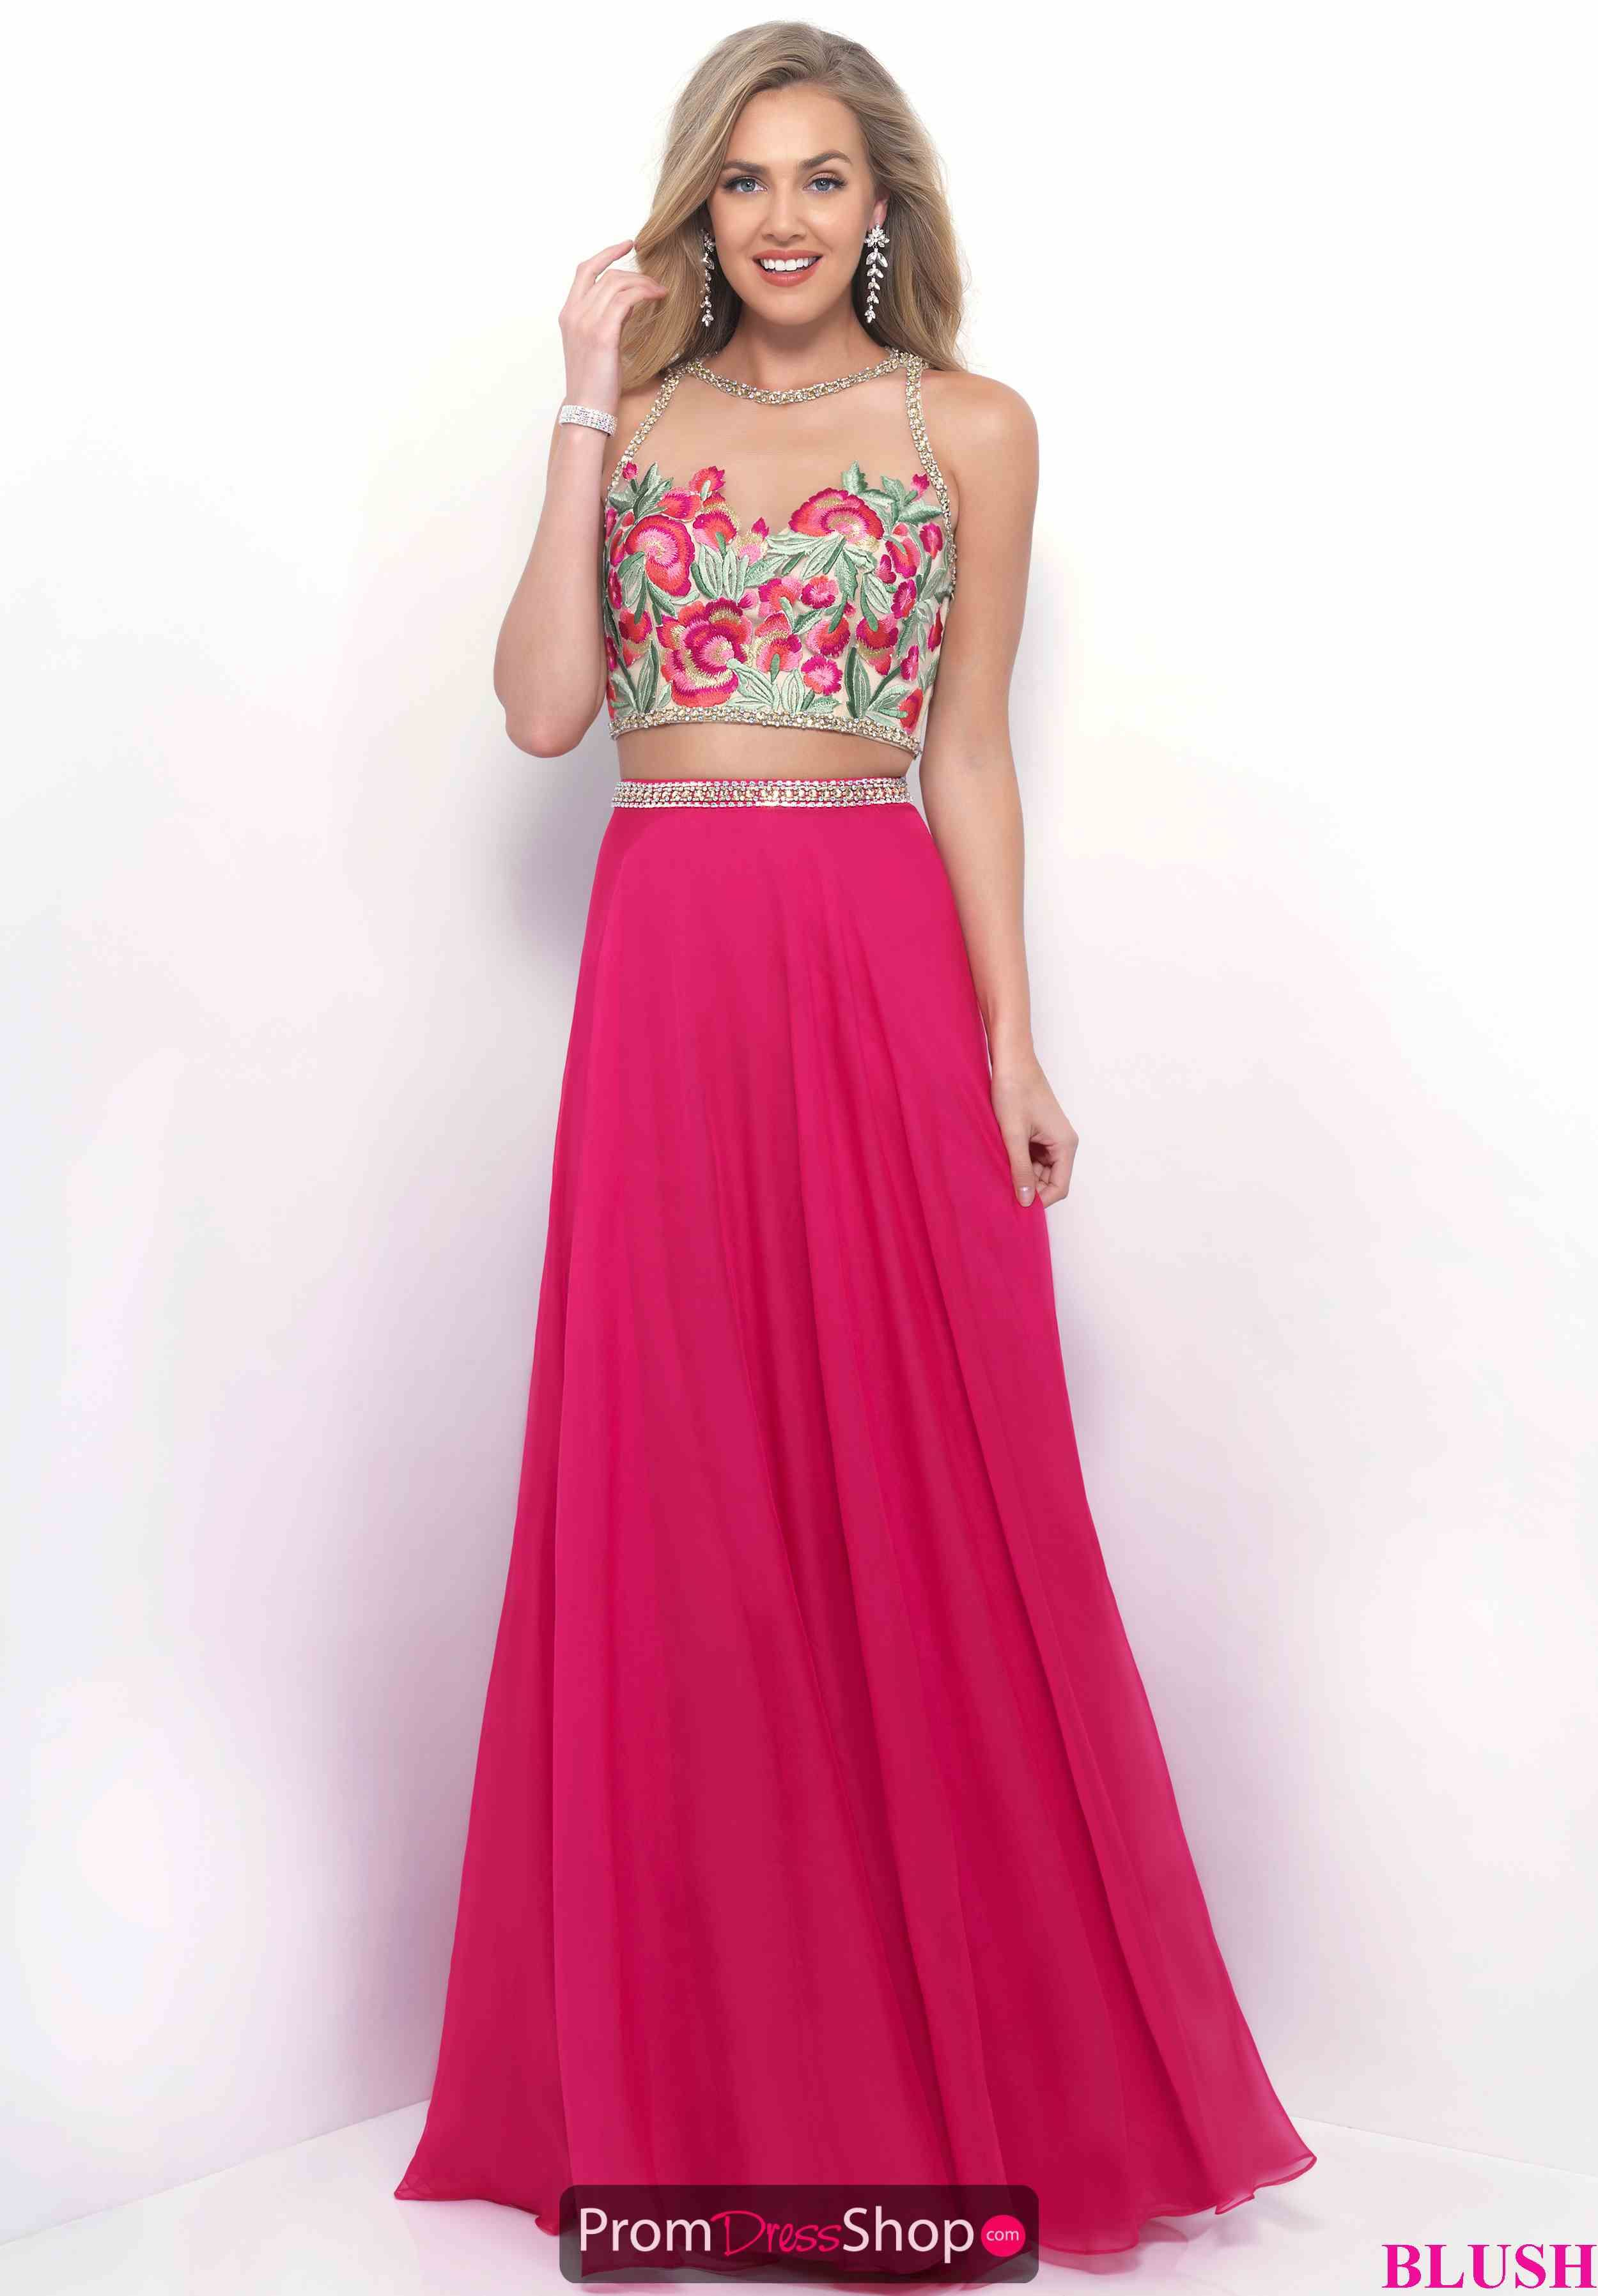 Blush dress in dresses pinterest prom dresses prom